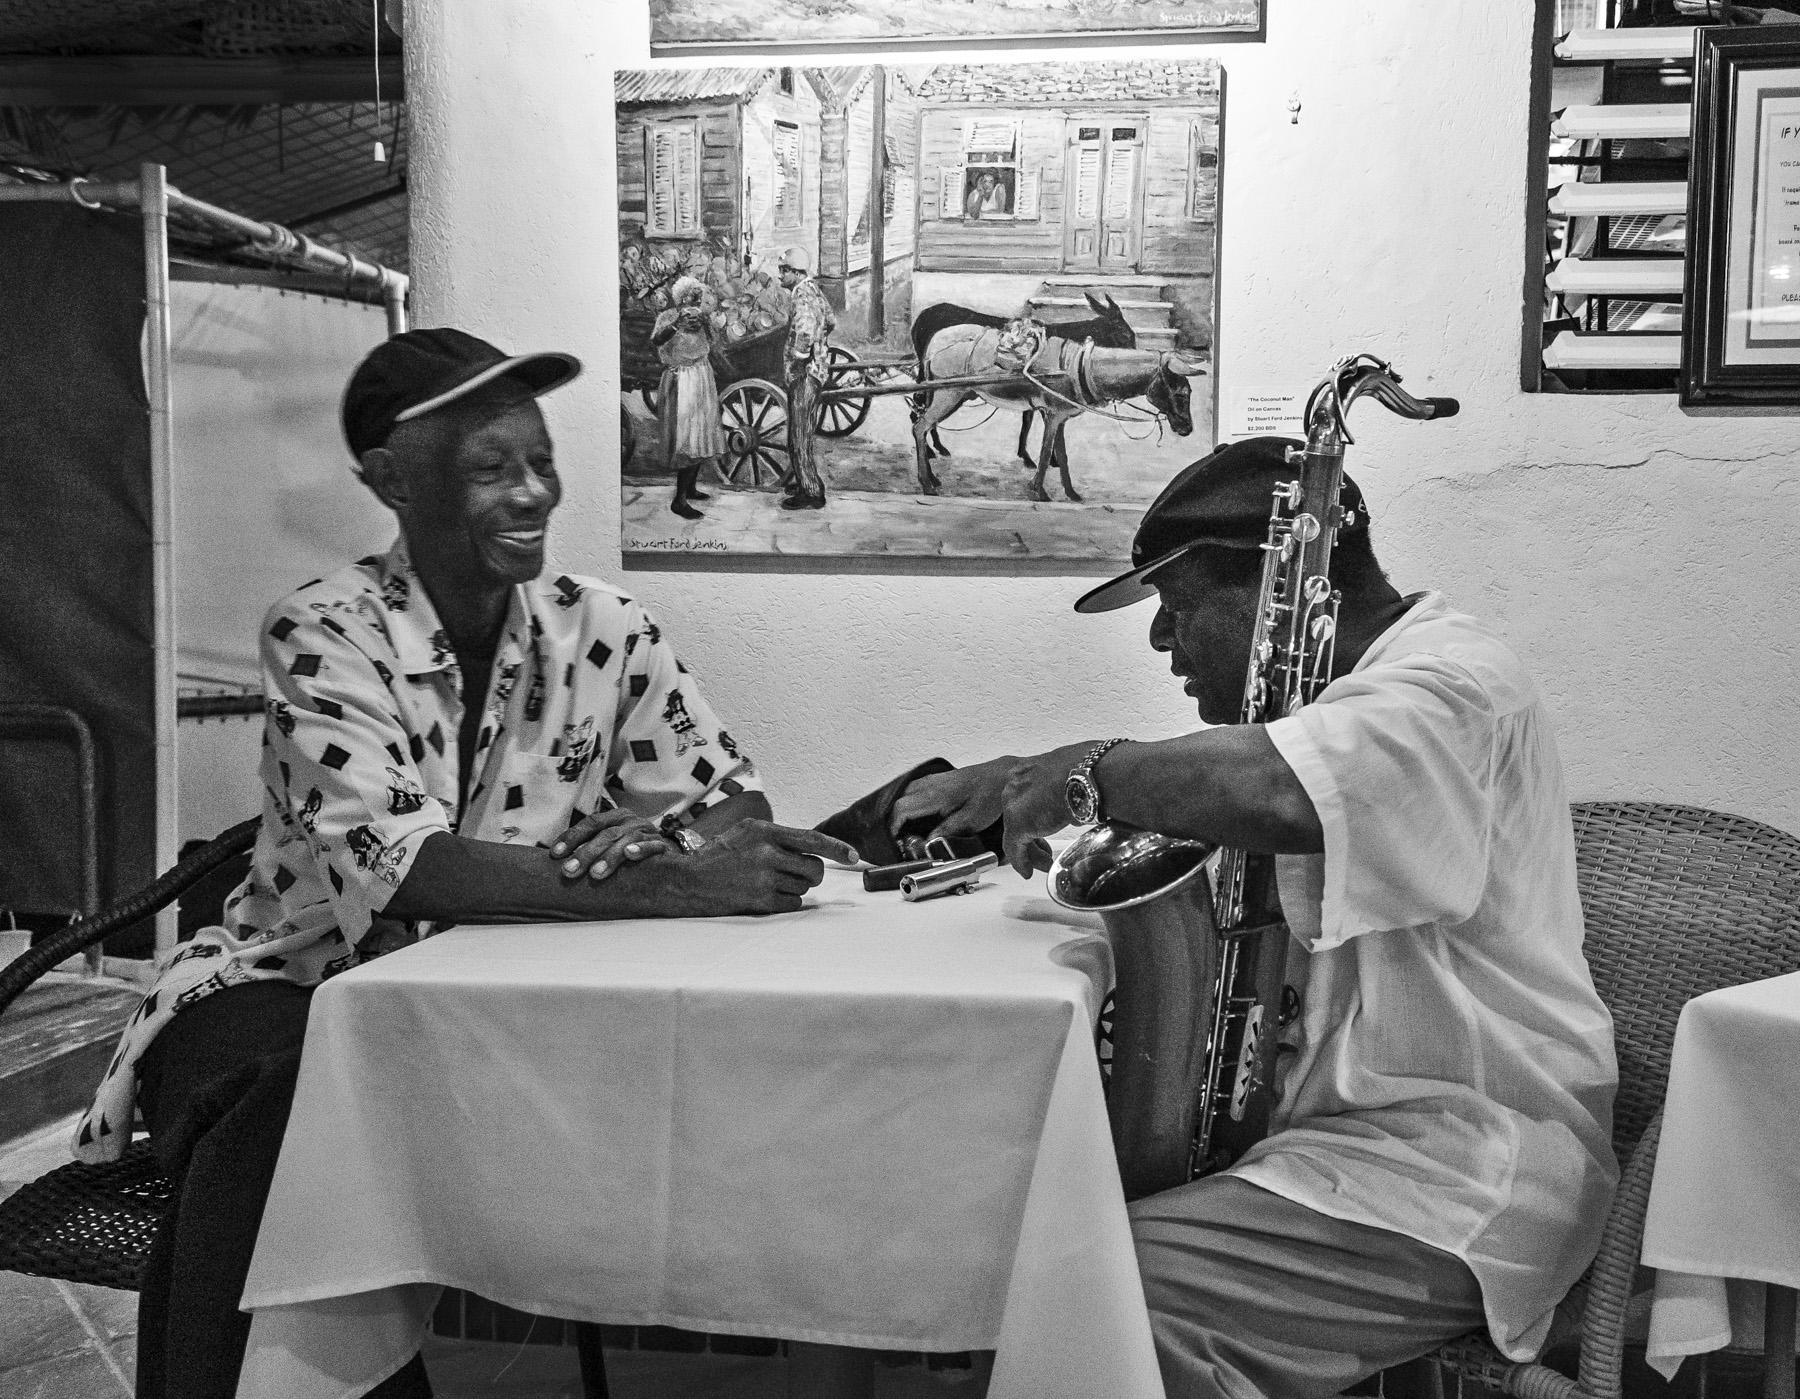 Barbados_Bridgetown_Lobster live_Colin Dyall_-44